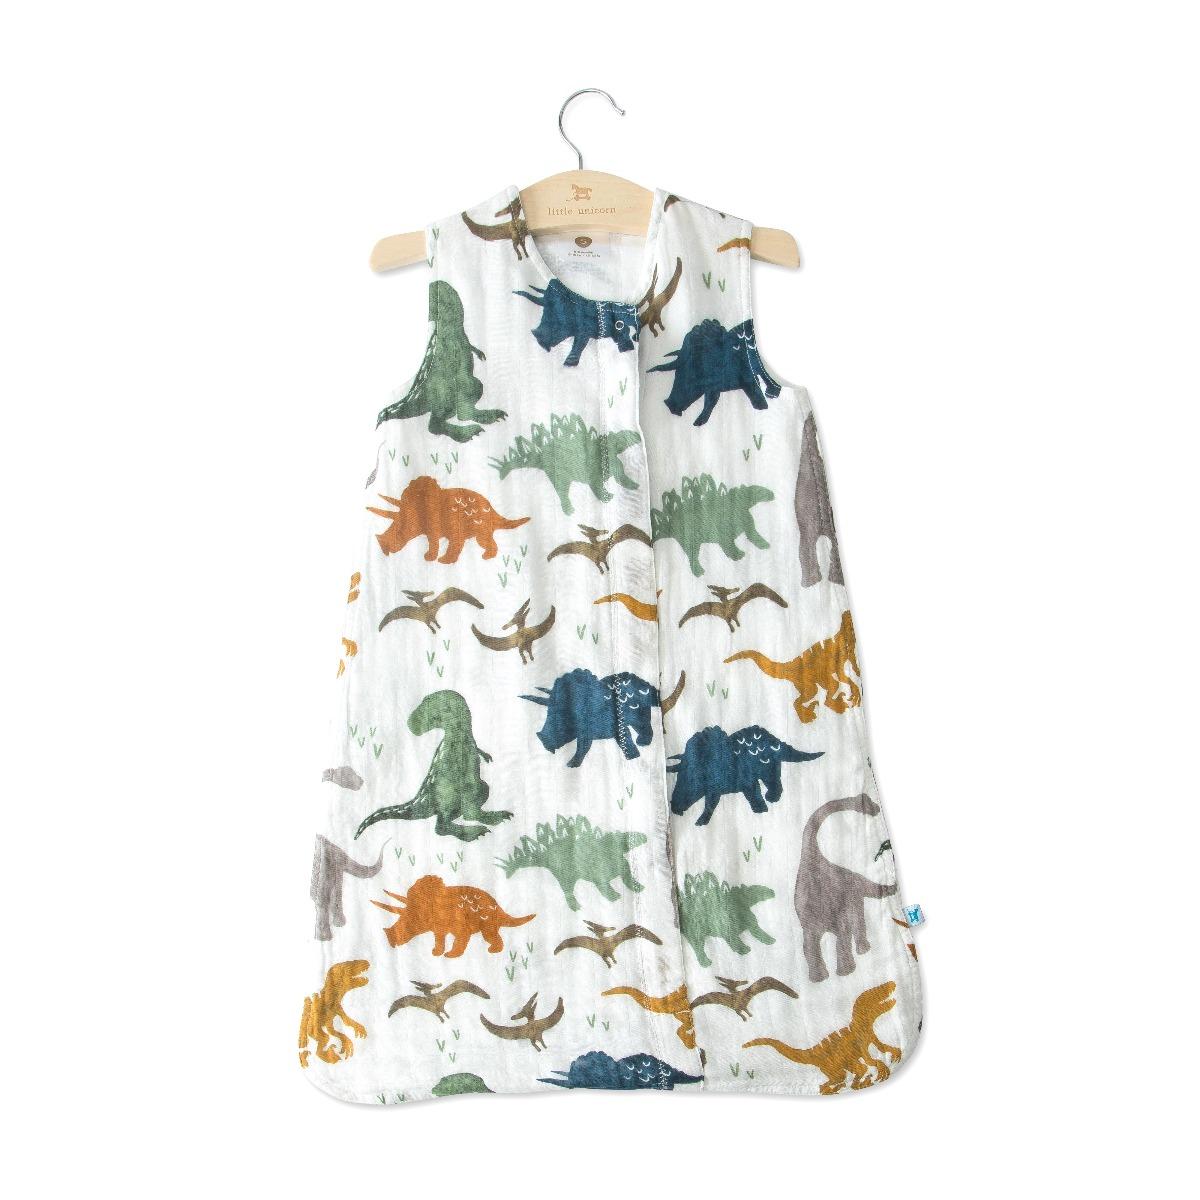 Little Unicorn Cotton Muslin Sleep Bag Small Dino Friends